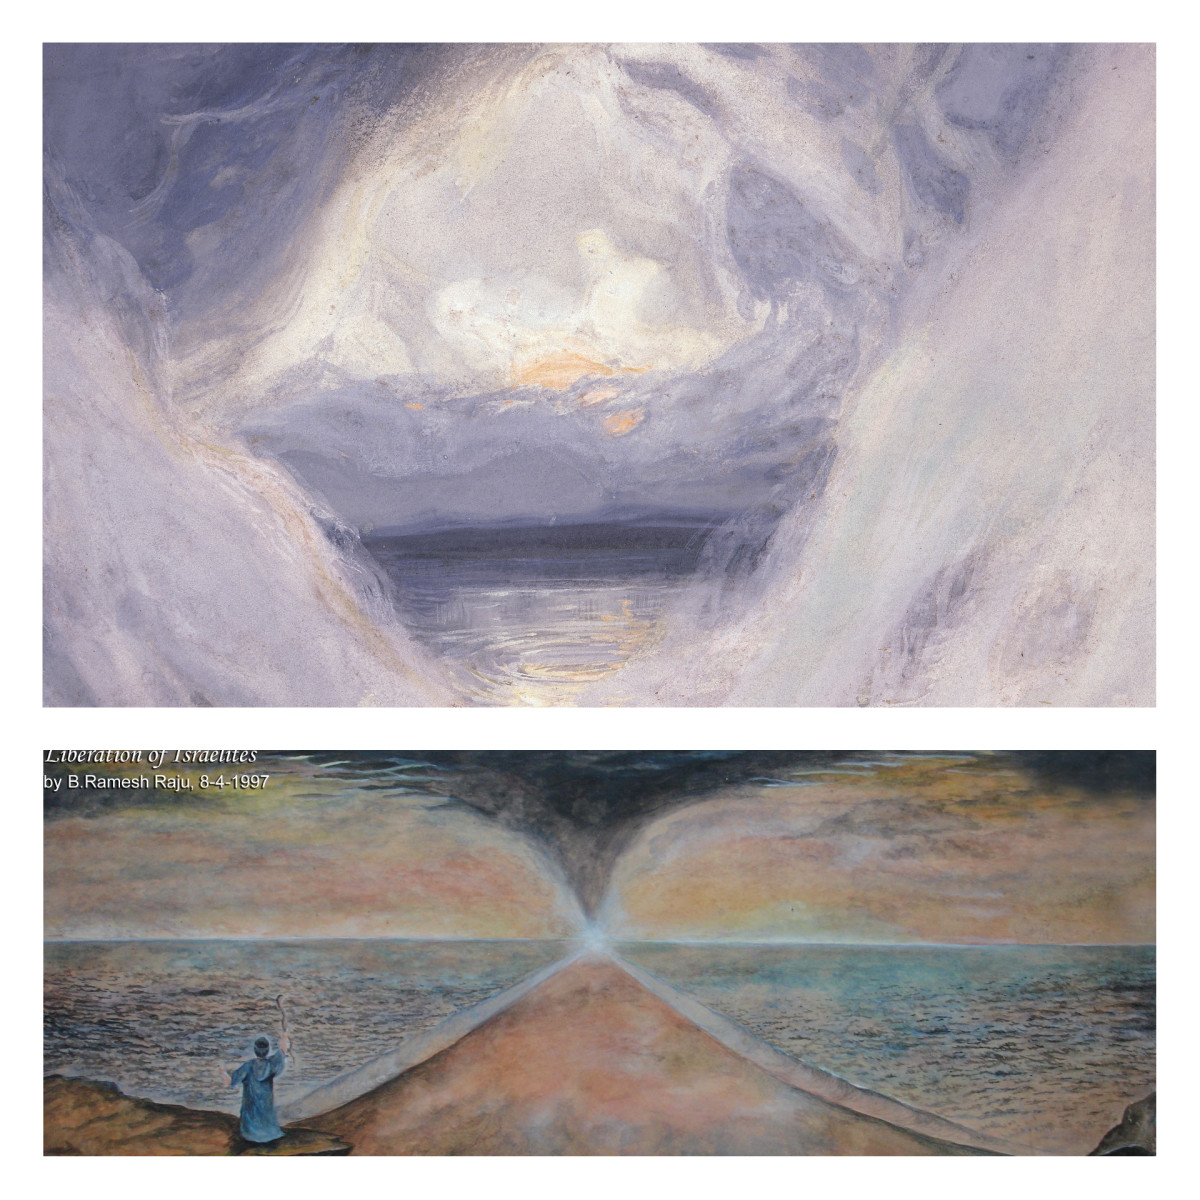 Artist James Tissot